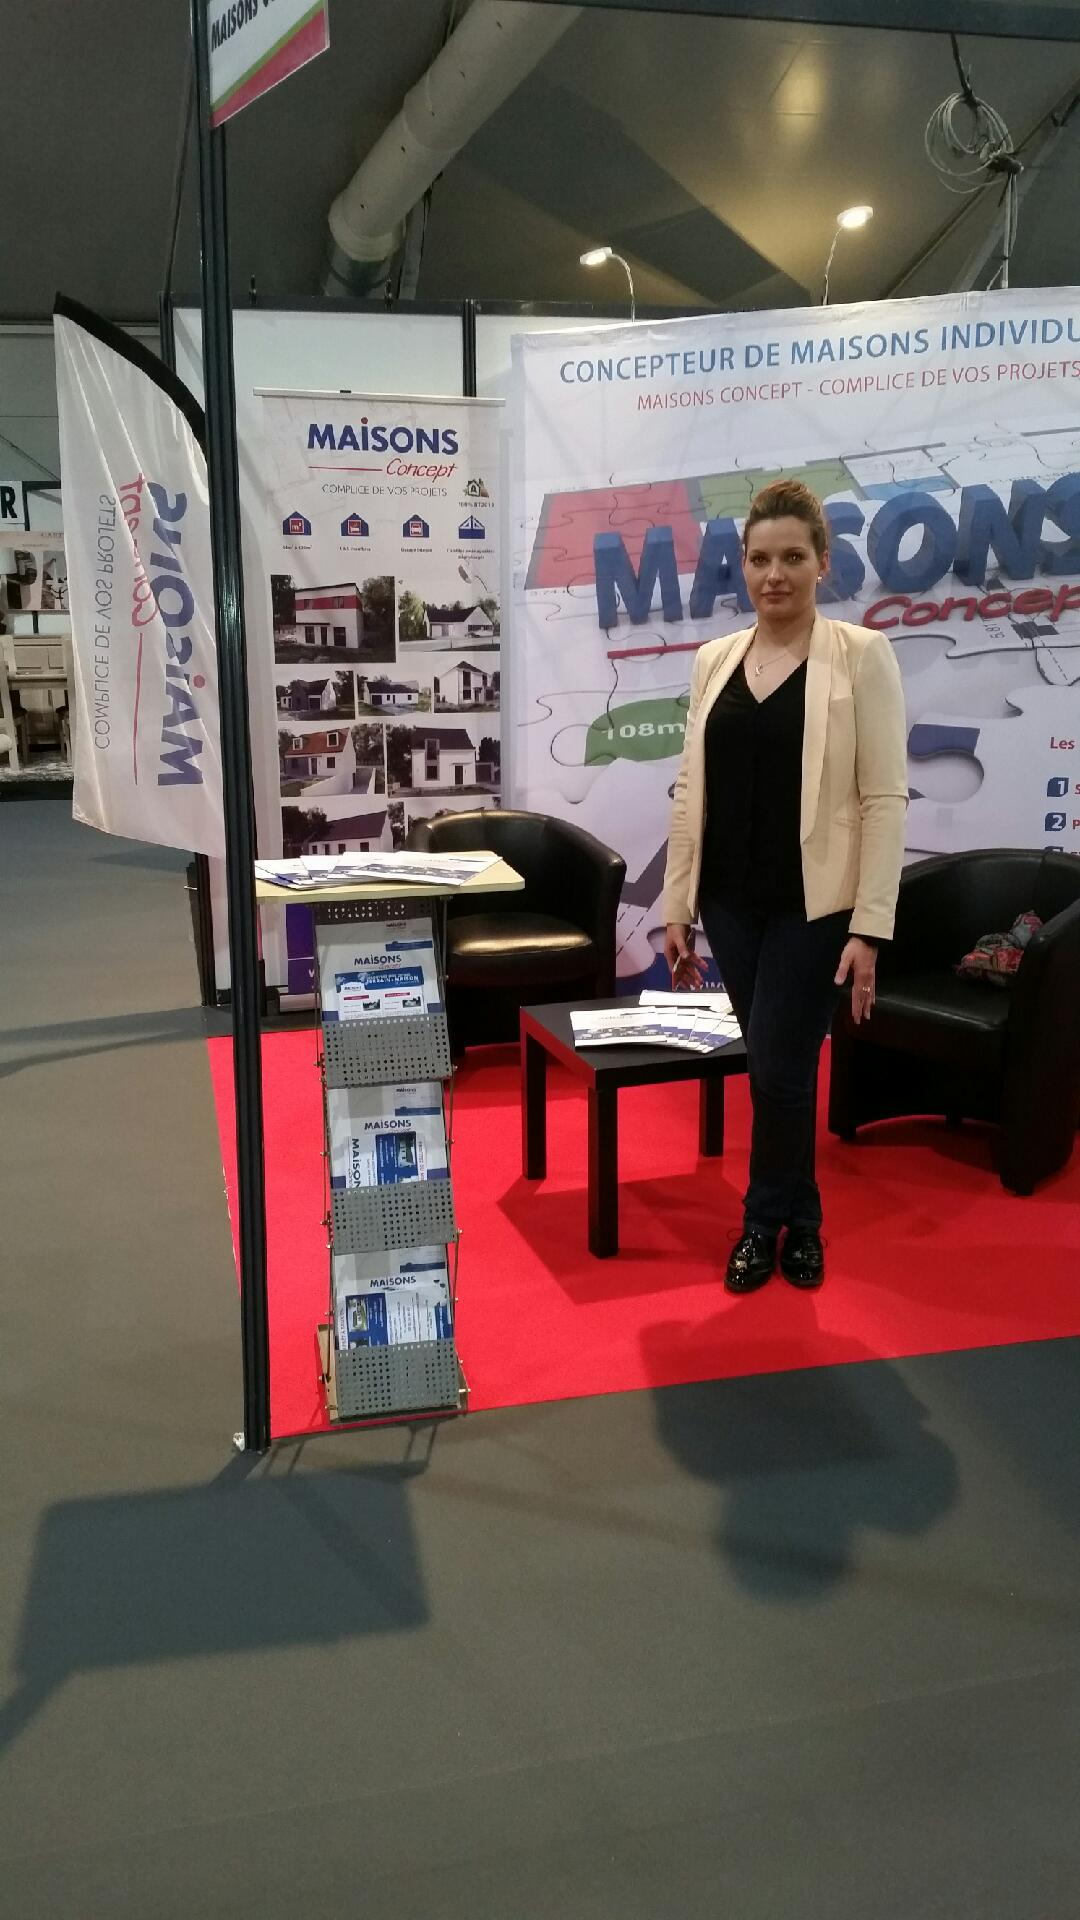 Salon de l 39 habitat de saumur 17 au 20 mars 2017 maisons - Salon de l habitat chambery ...